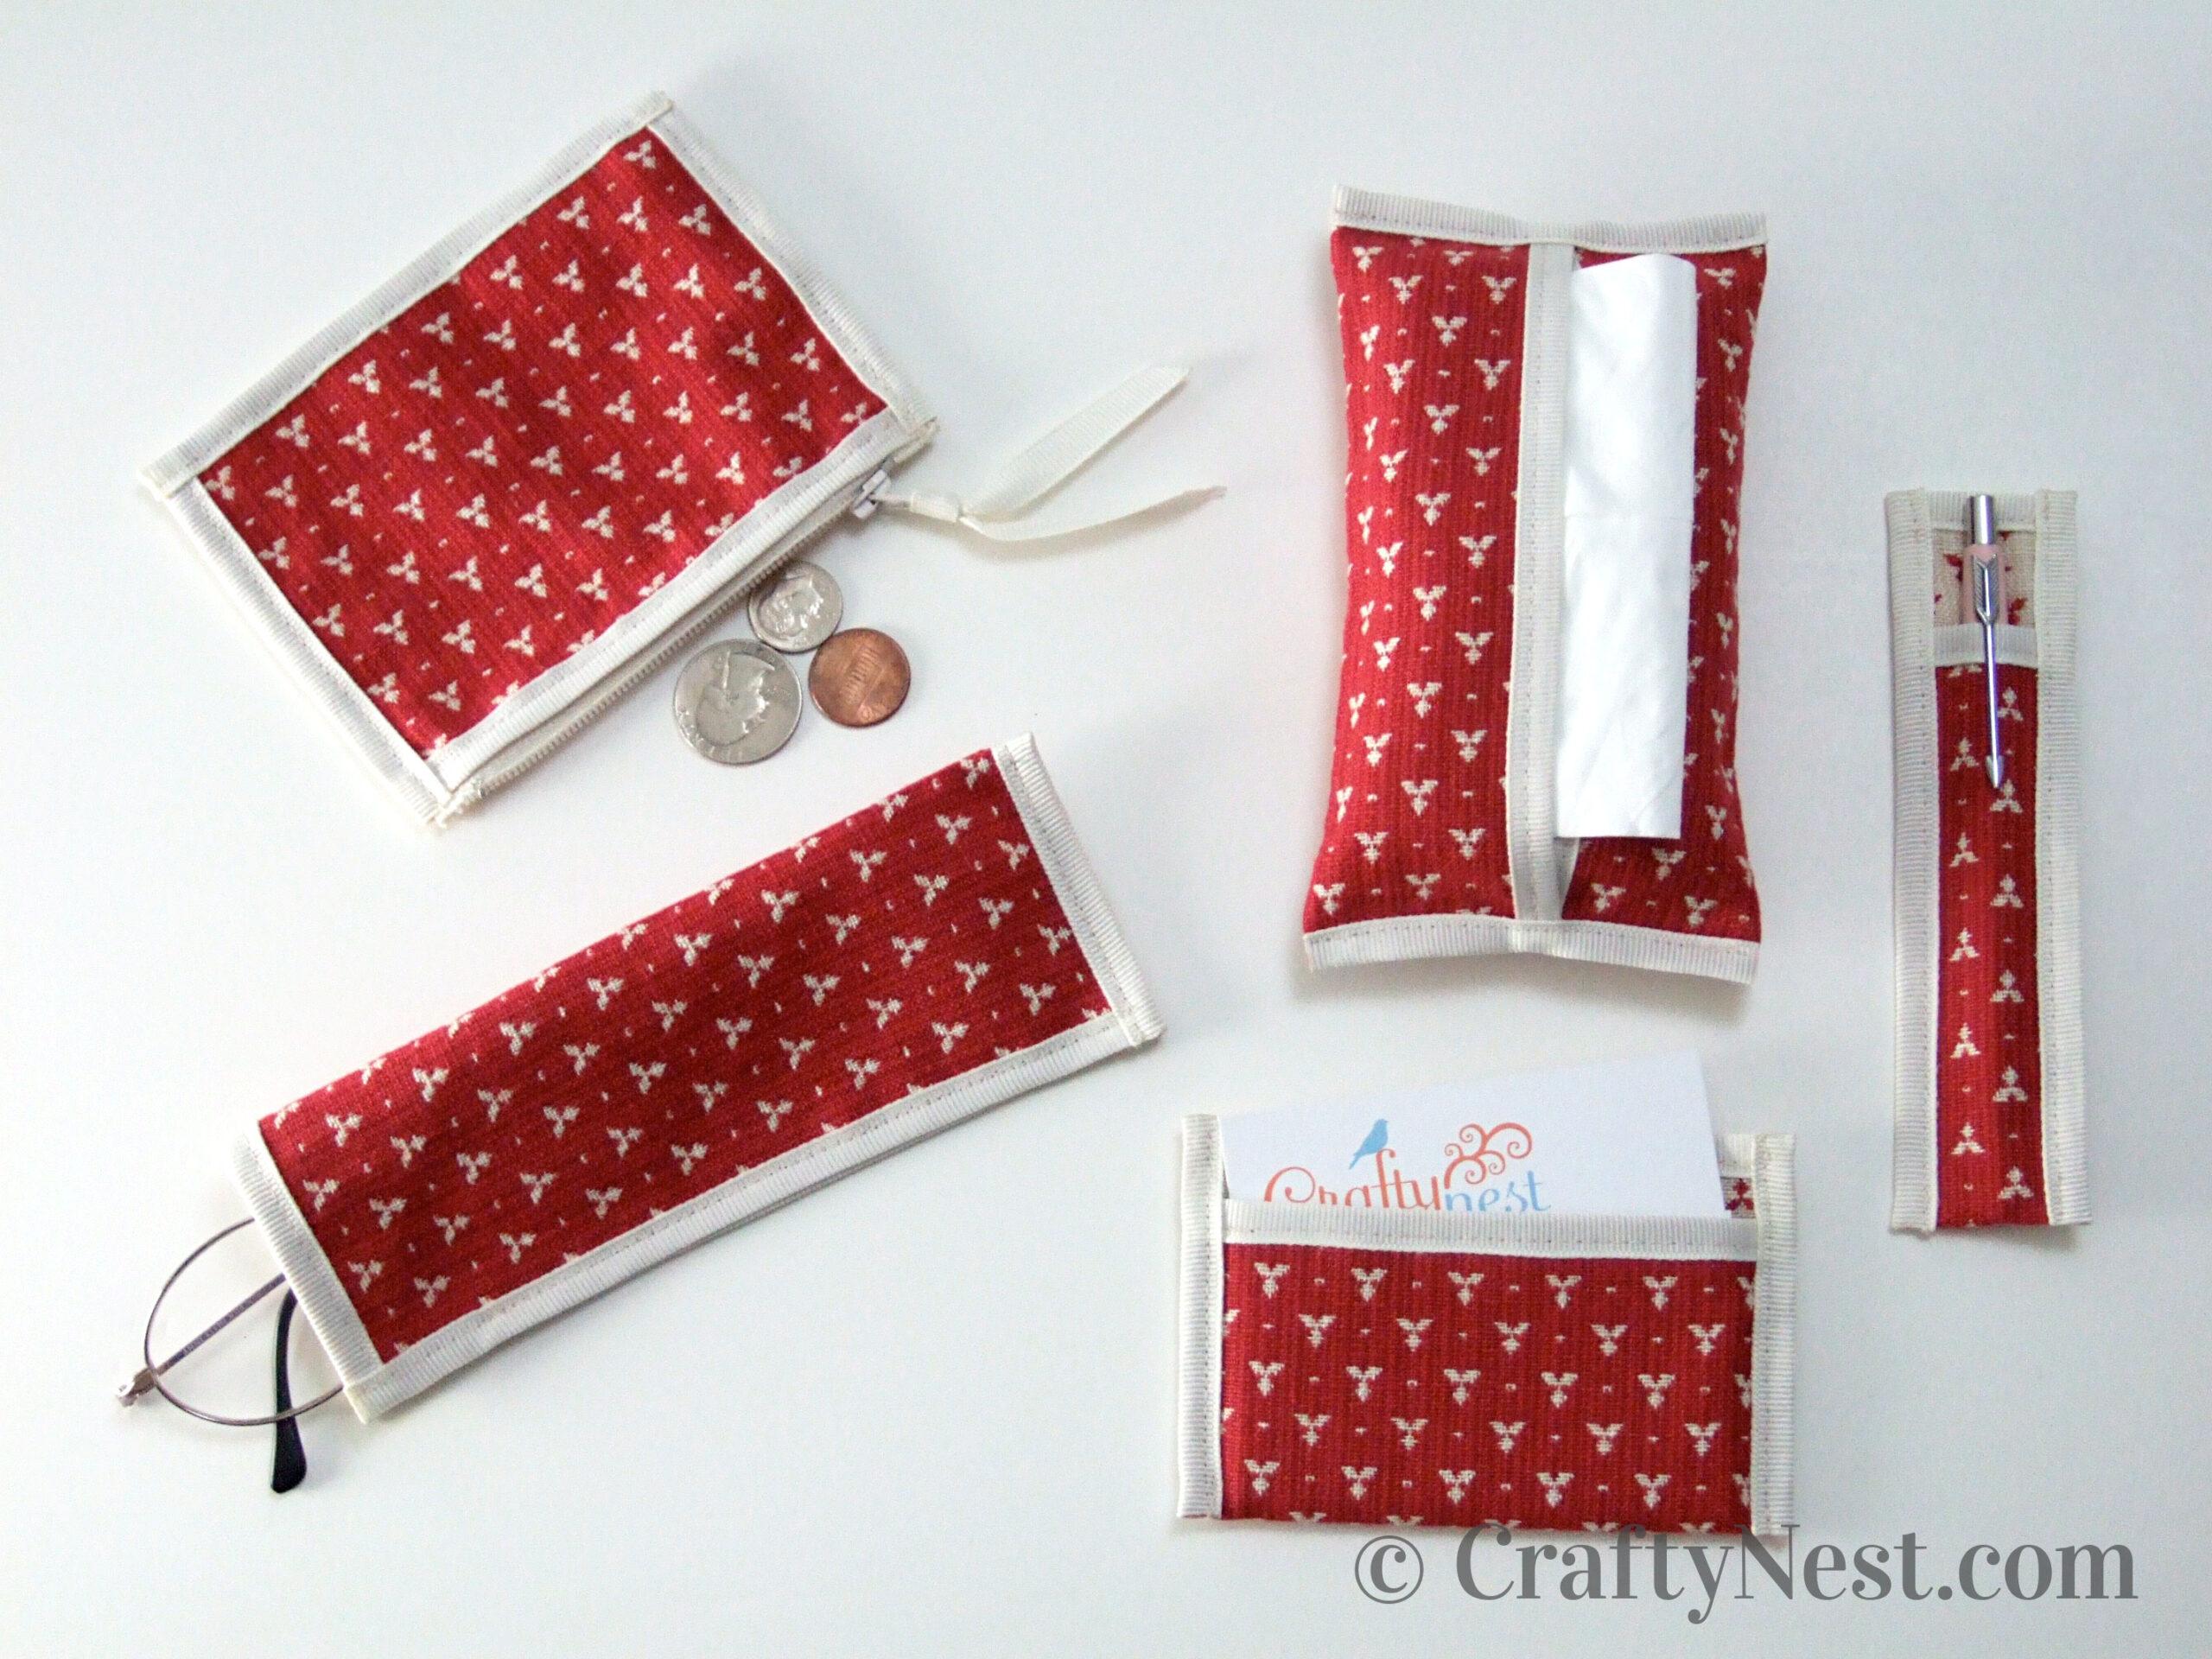 Set of handmade purse pouches, photo